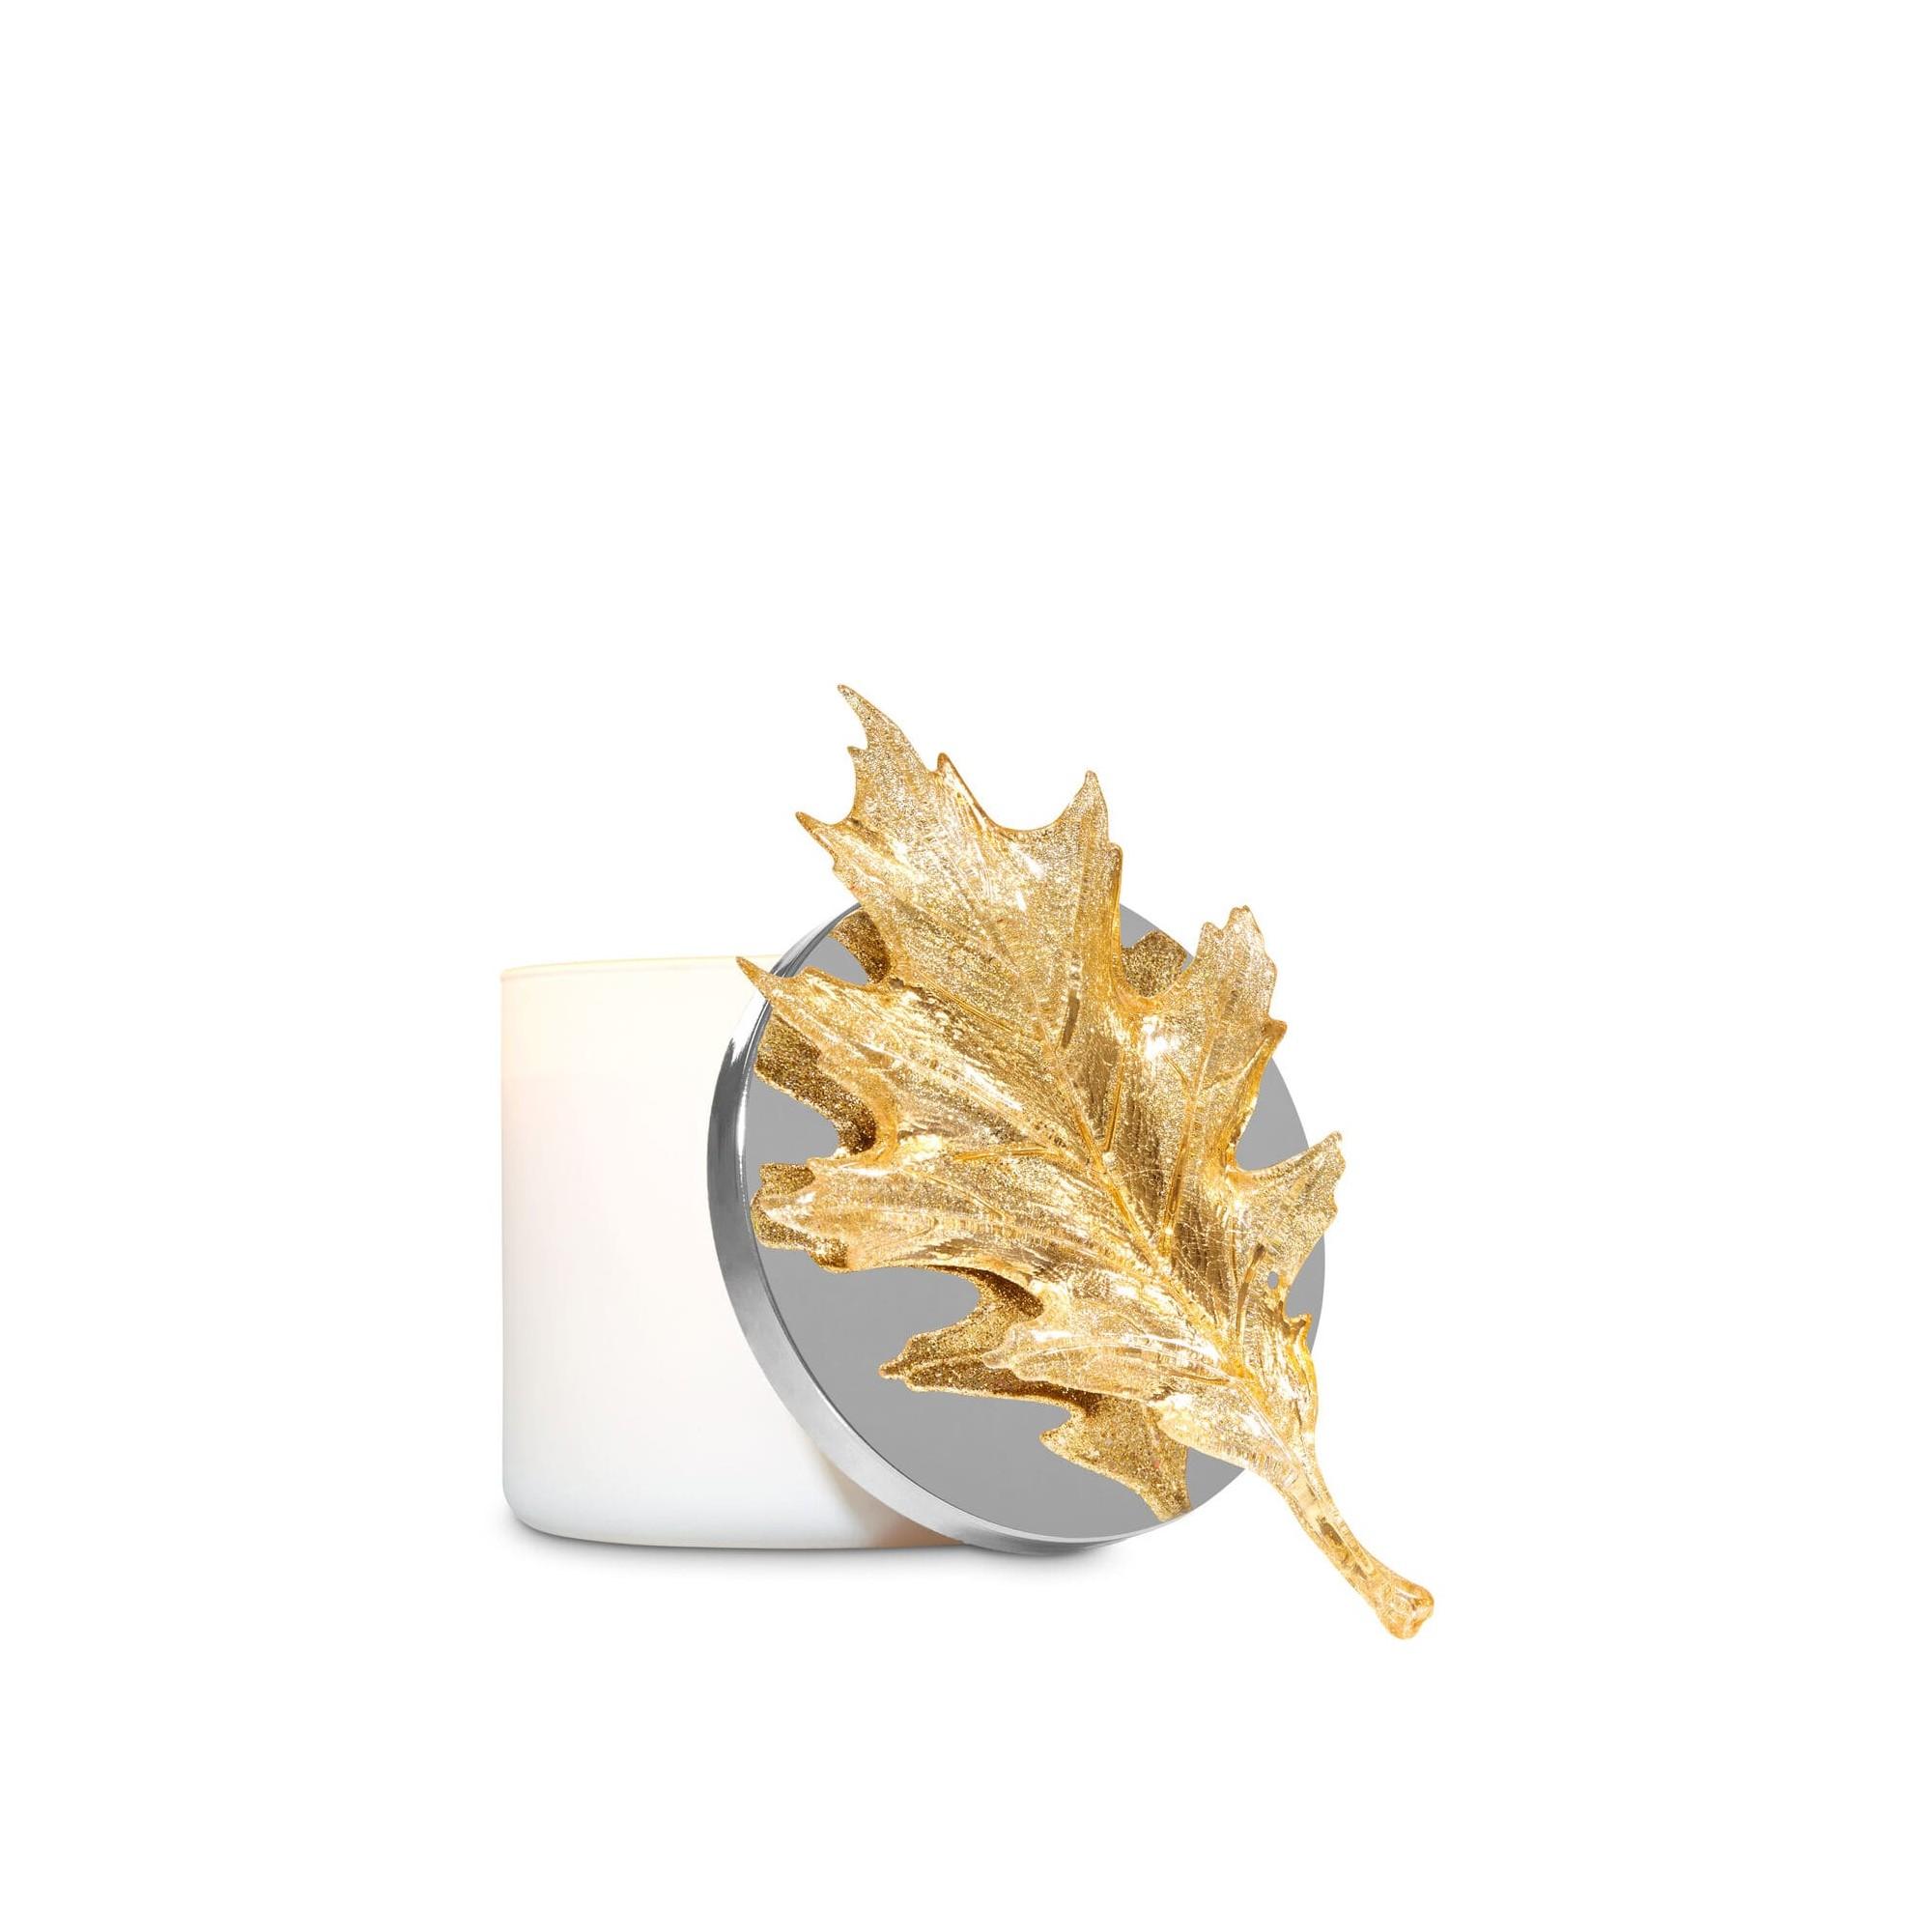 Bath & Body Works Glittery Gold Leaf 3-Wick Candle Magnet